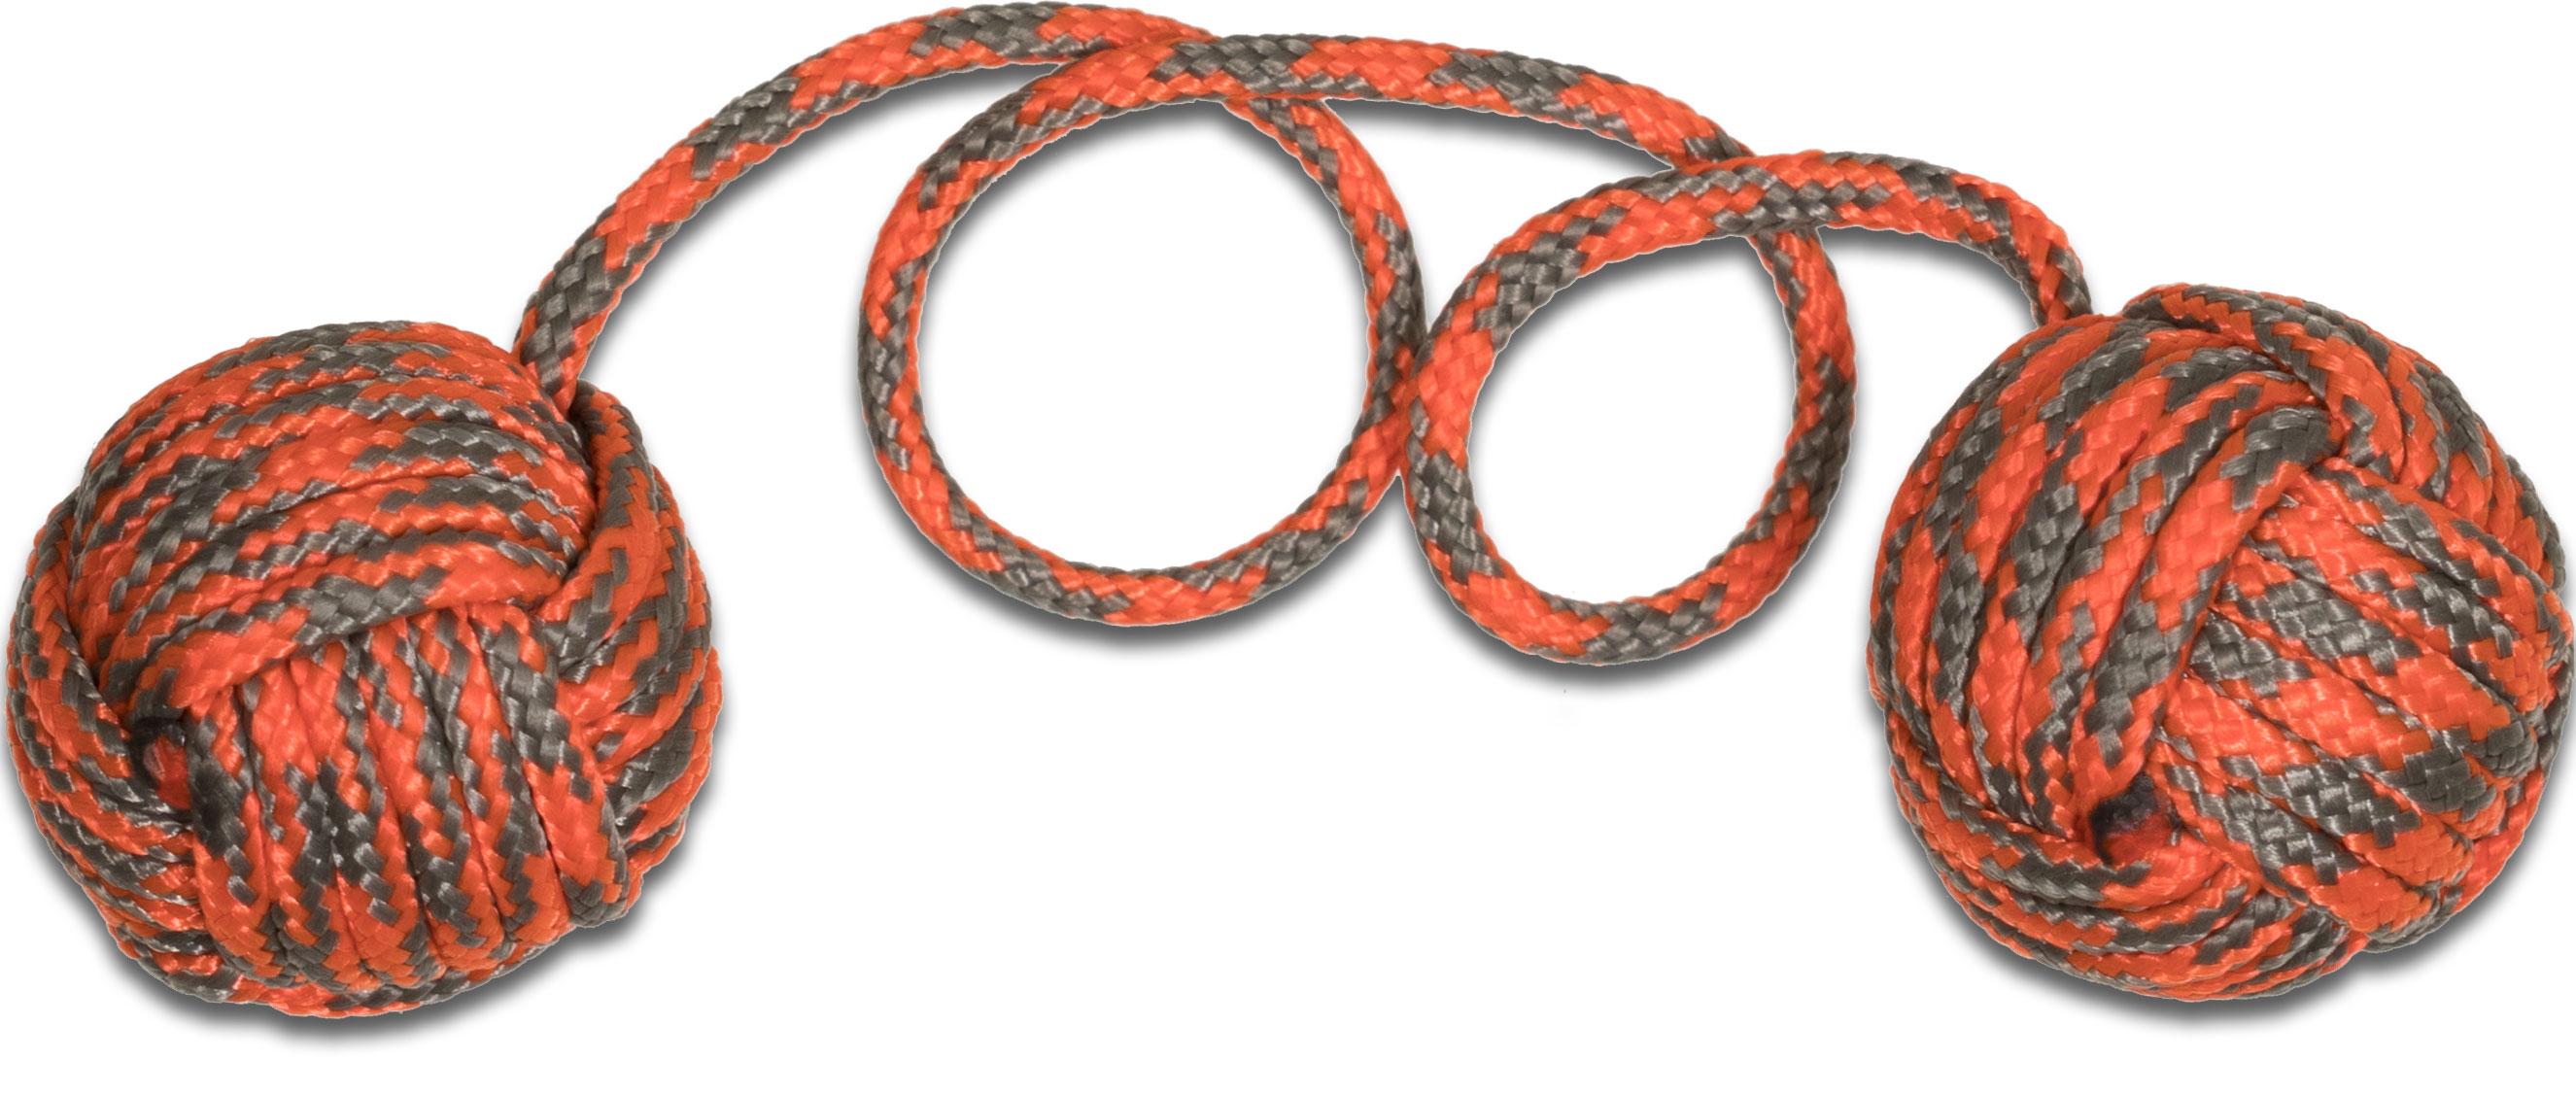 Monkey Fist Begleri KnifeCenter Exclusive 6 inch Orange/Gray Paracord